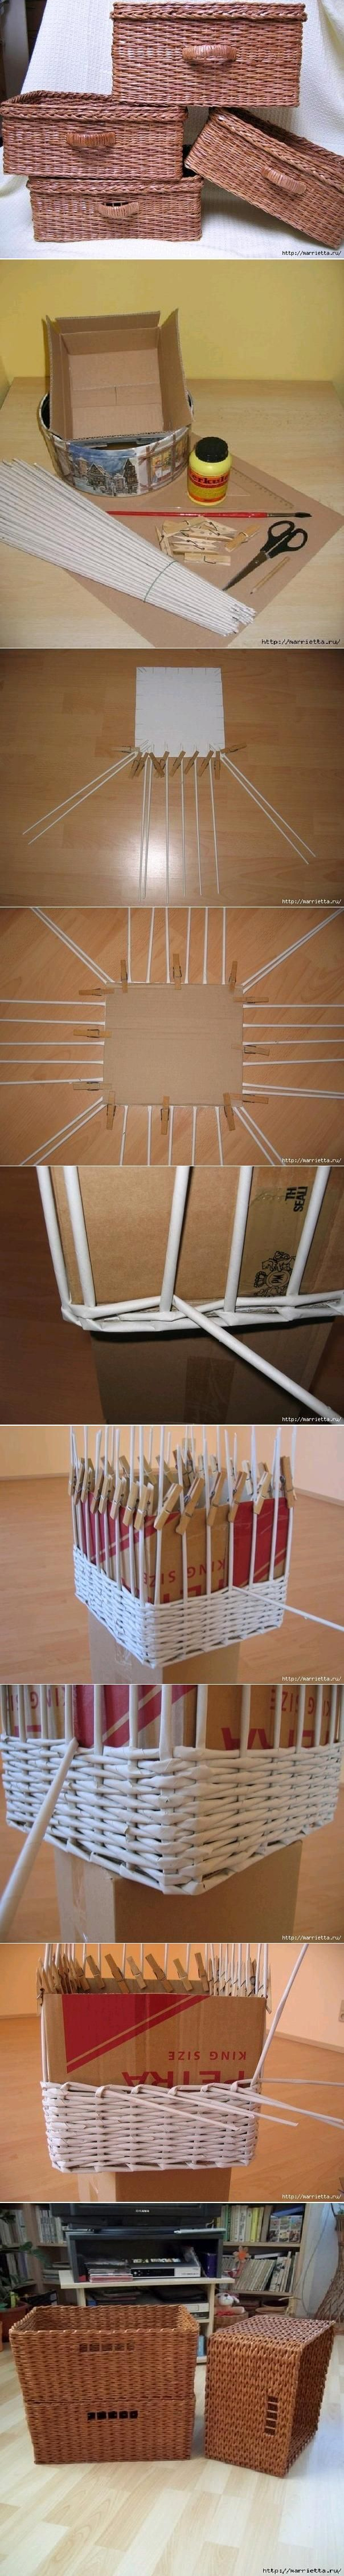 DIY Arts &  Crafts : DIY Newspaper Weave Basket